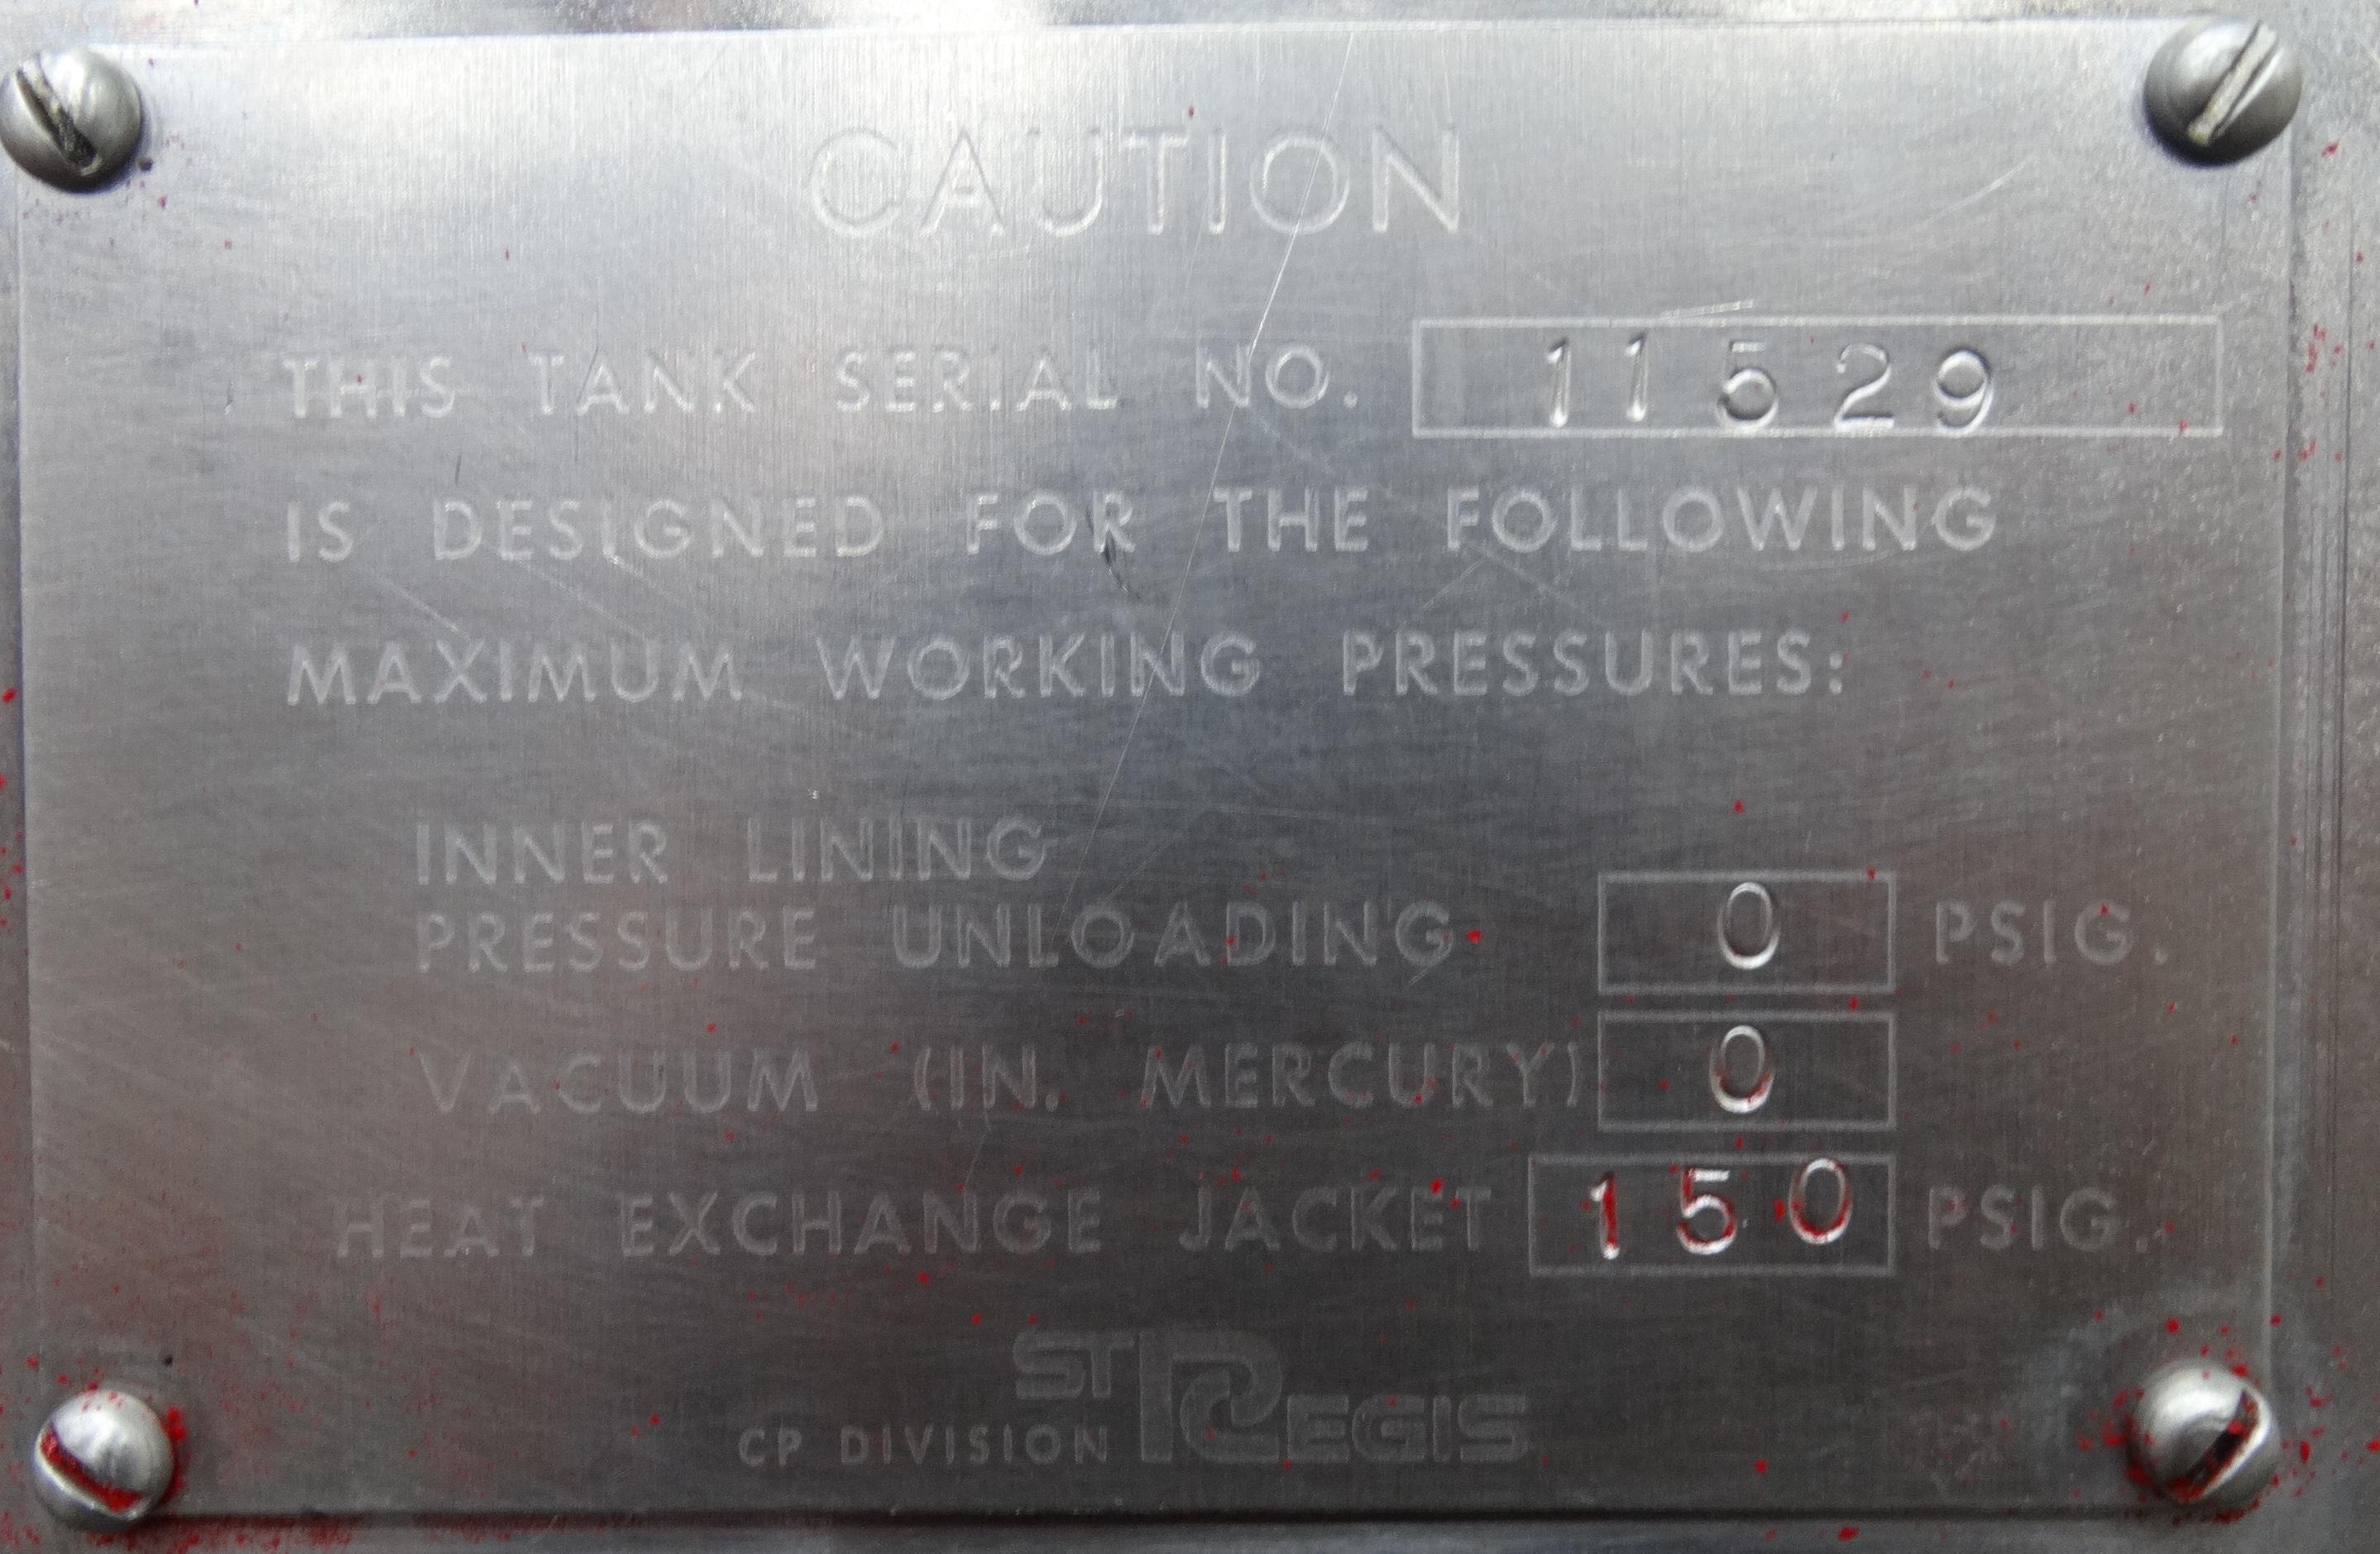 Regis 820 Gallon Ribbon Blender B3664 - Image 8 of 9